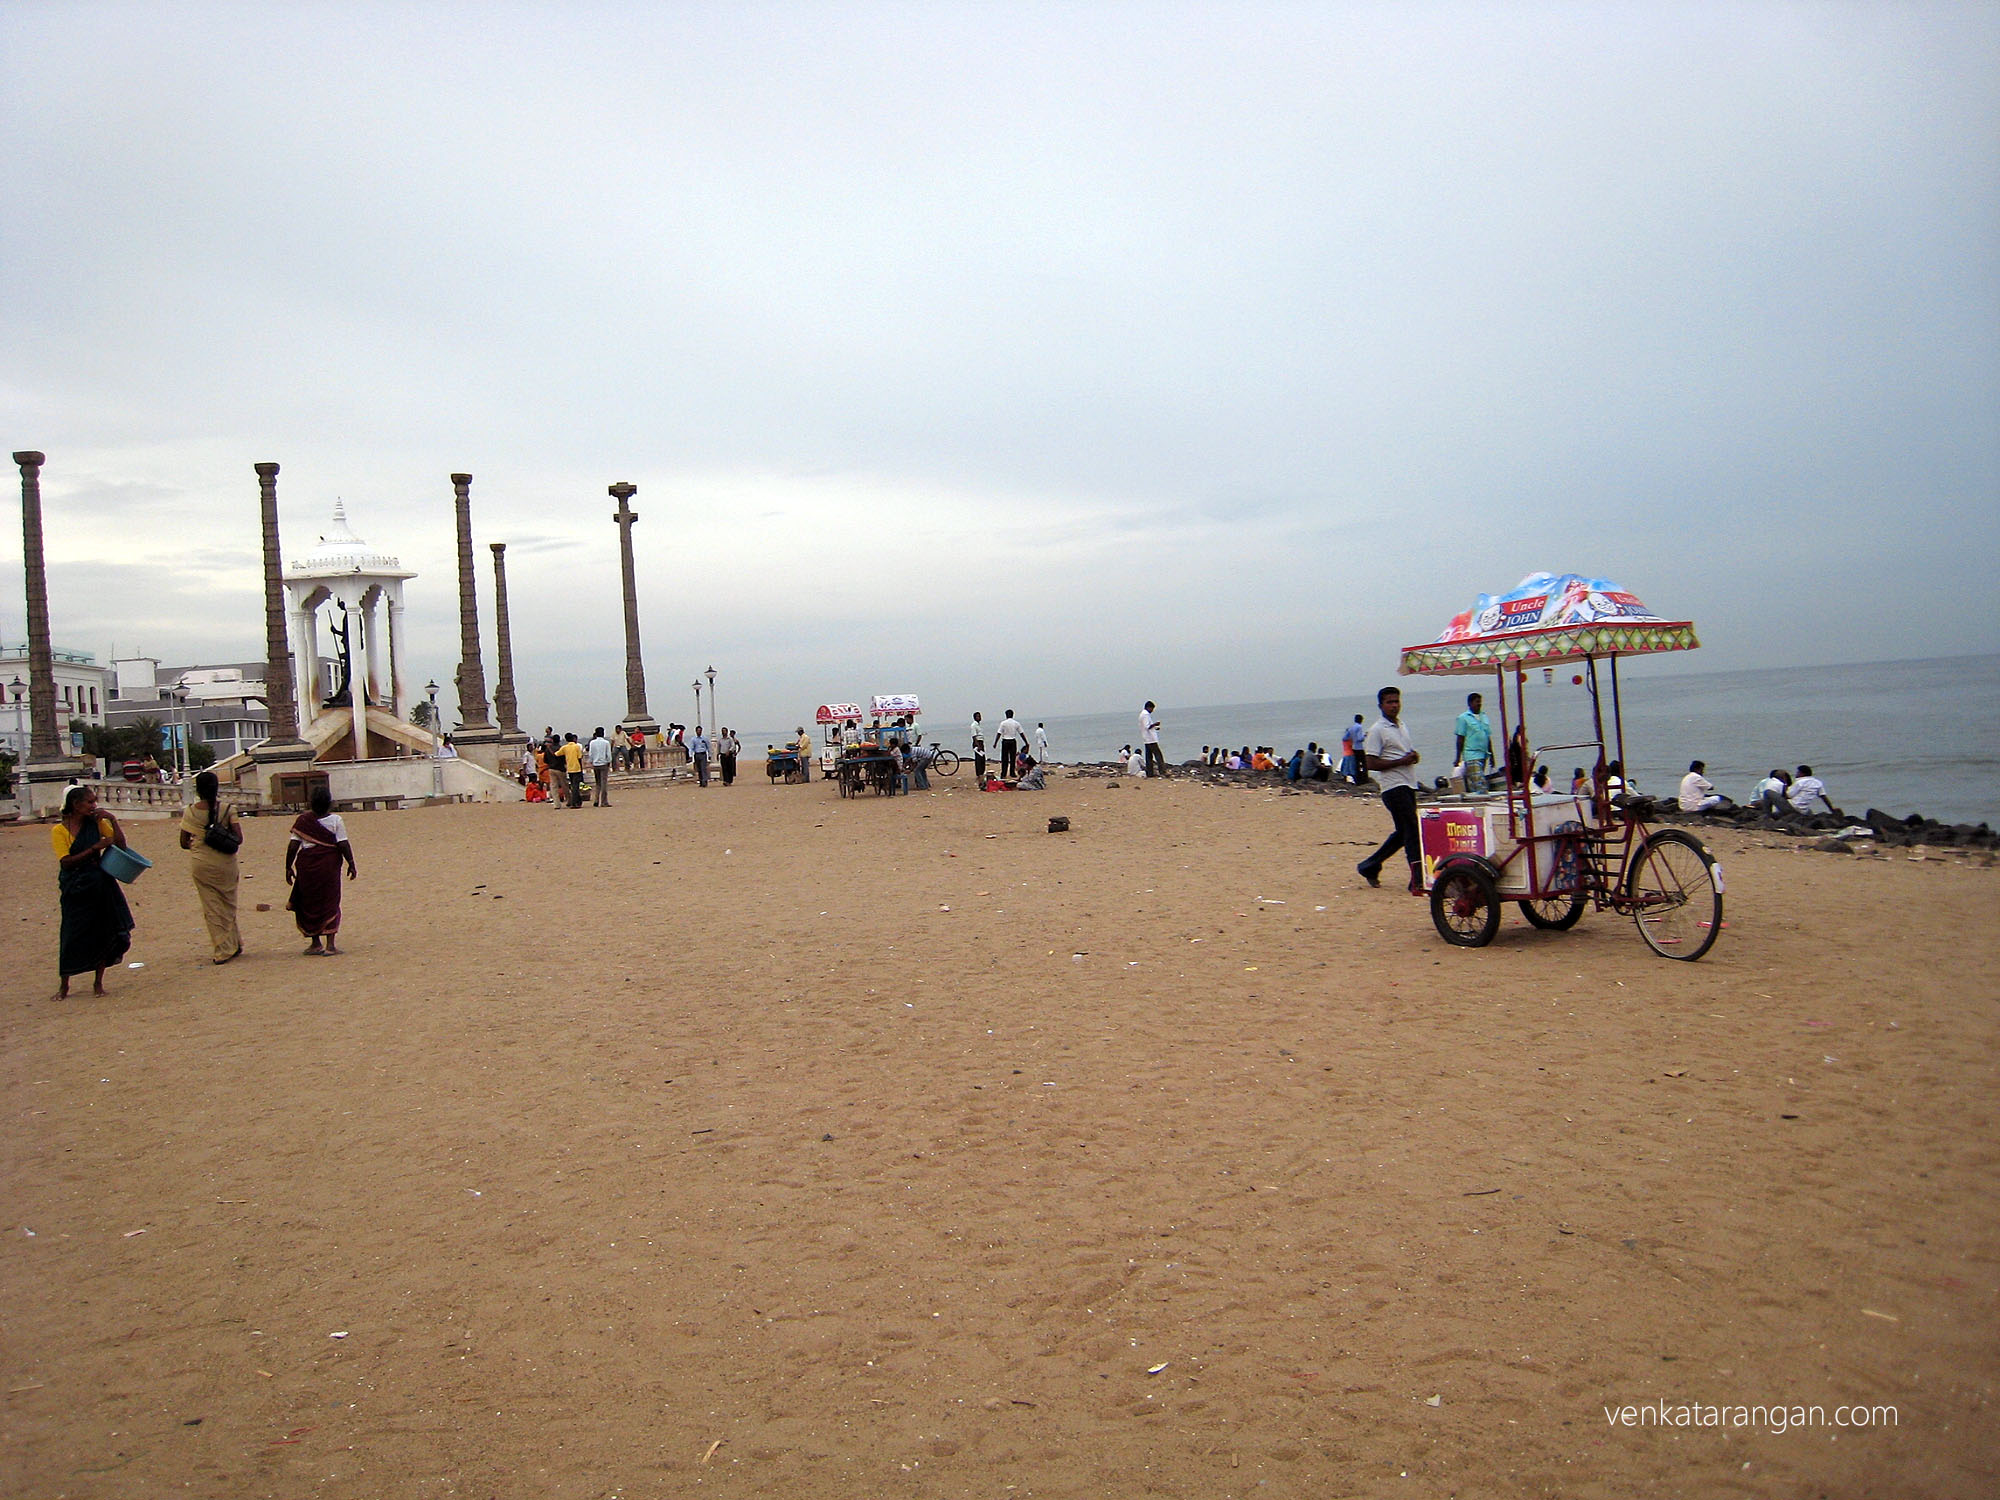 The famous pondicherry beach and Mahatma Gandhi statue